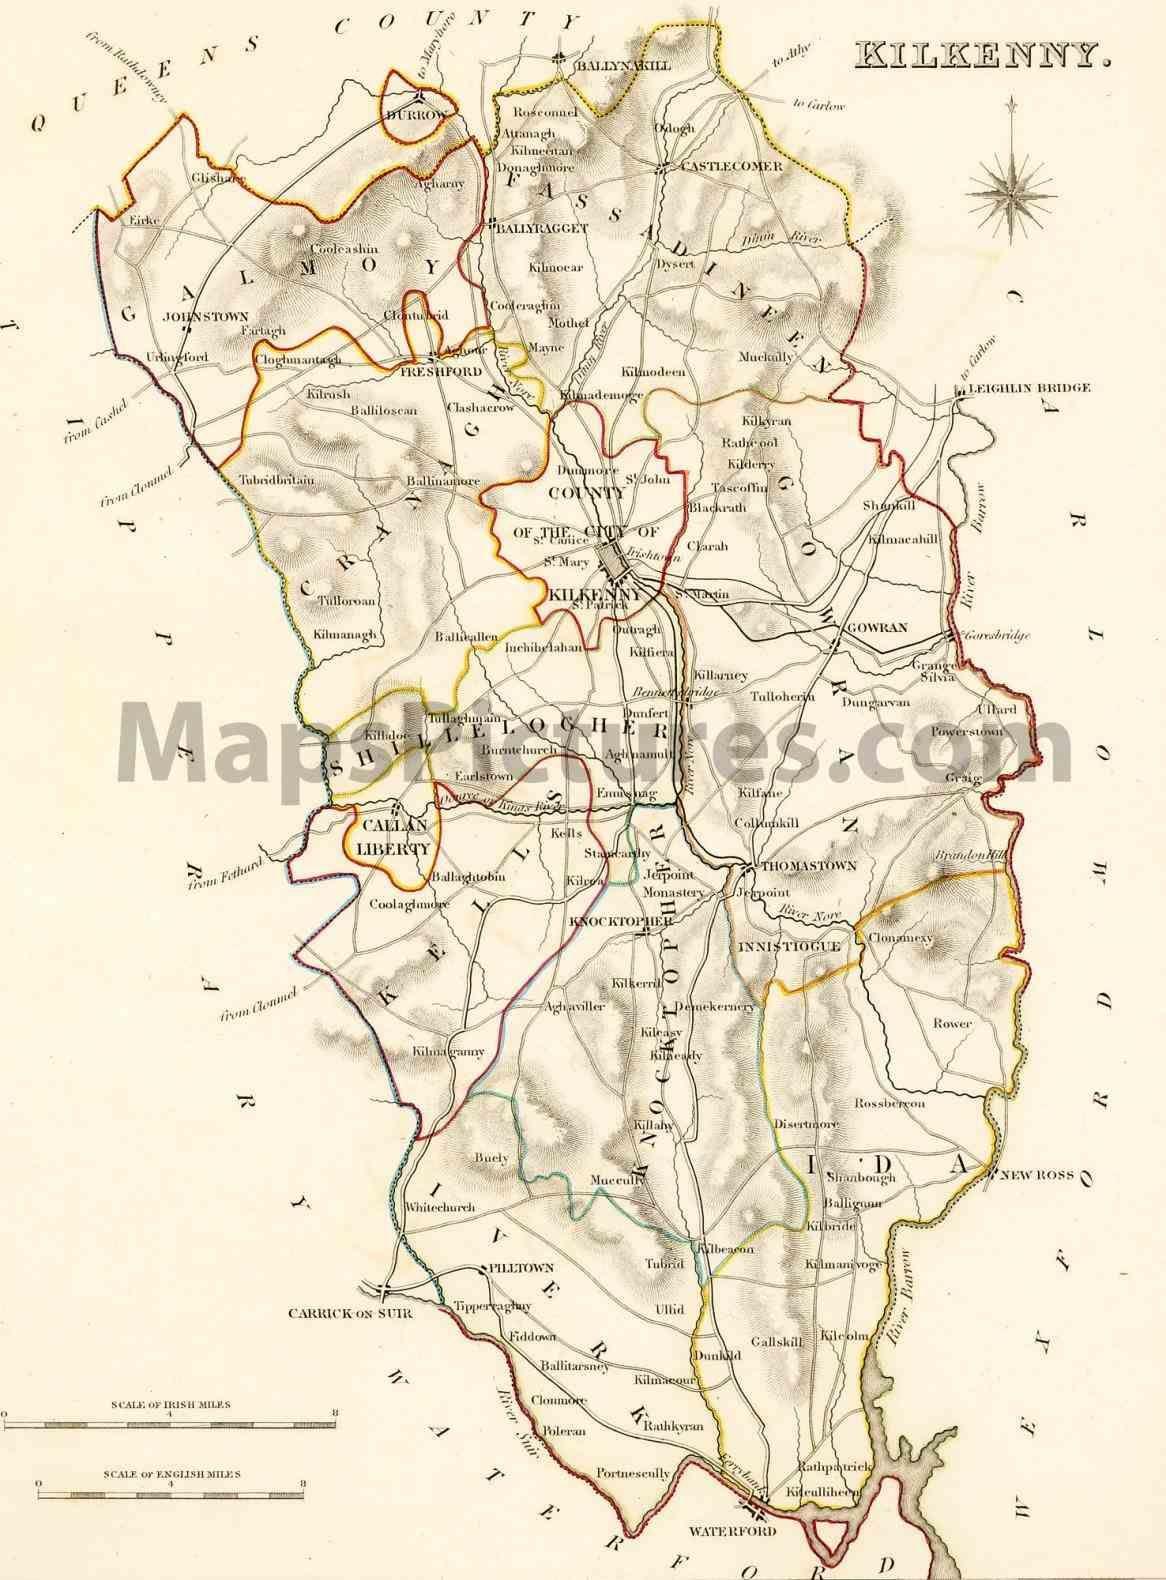 Blarney Ireland Map.High Peaks Challenge Of Castles In Blarney Castle See Details Of